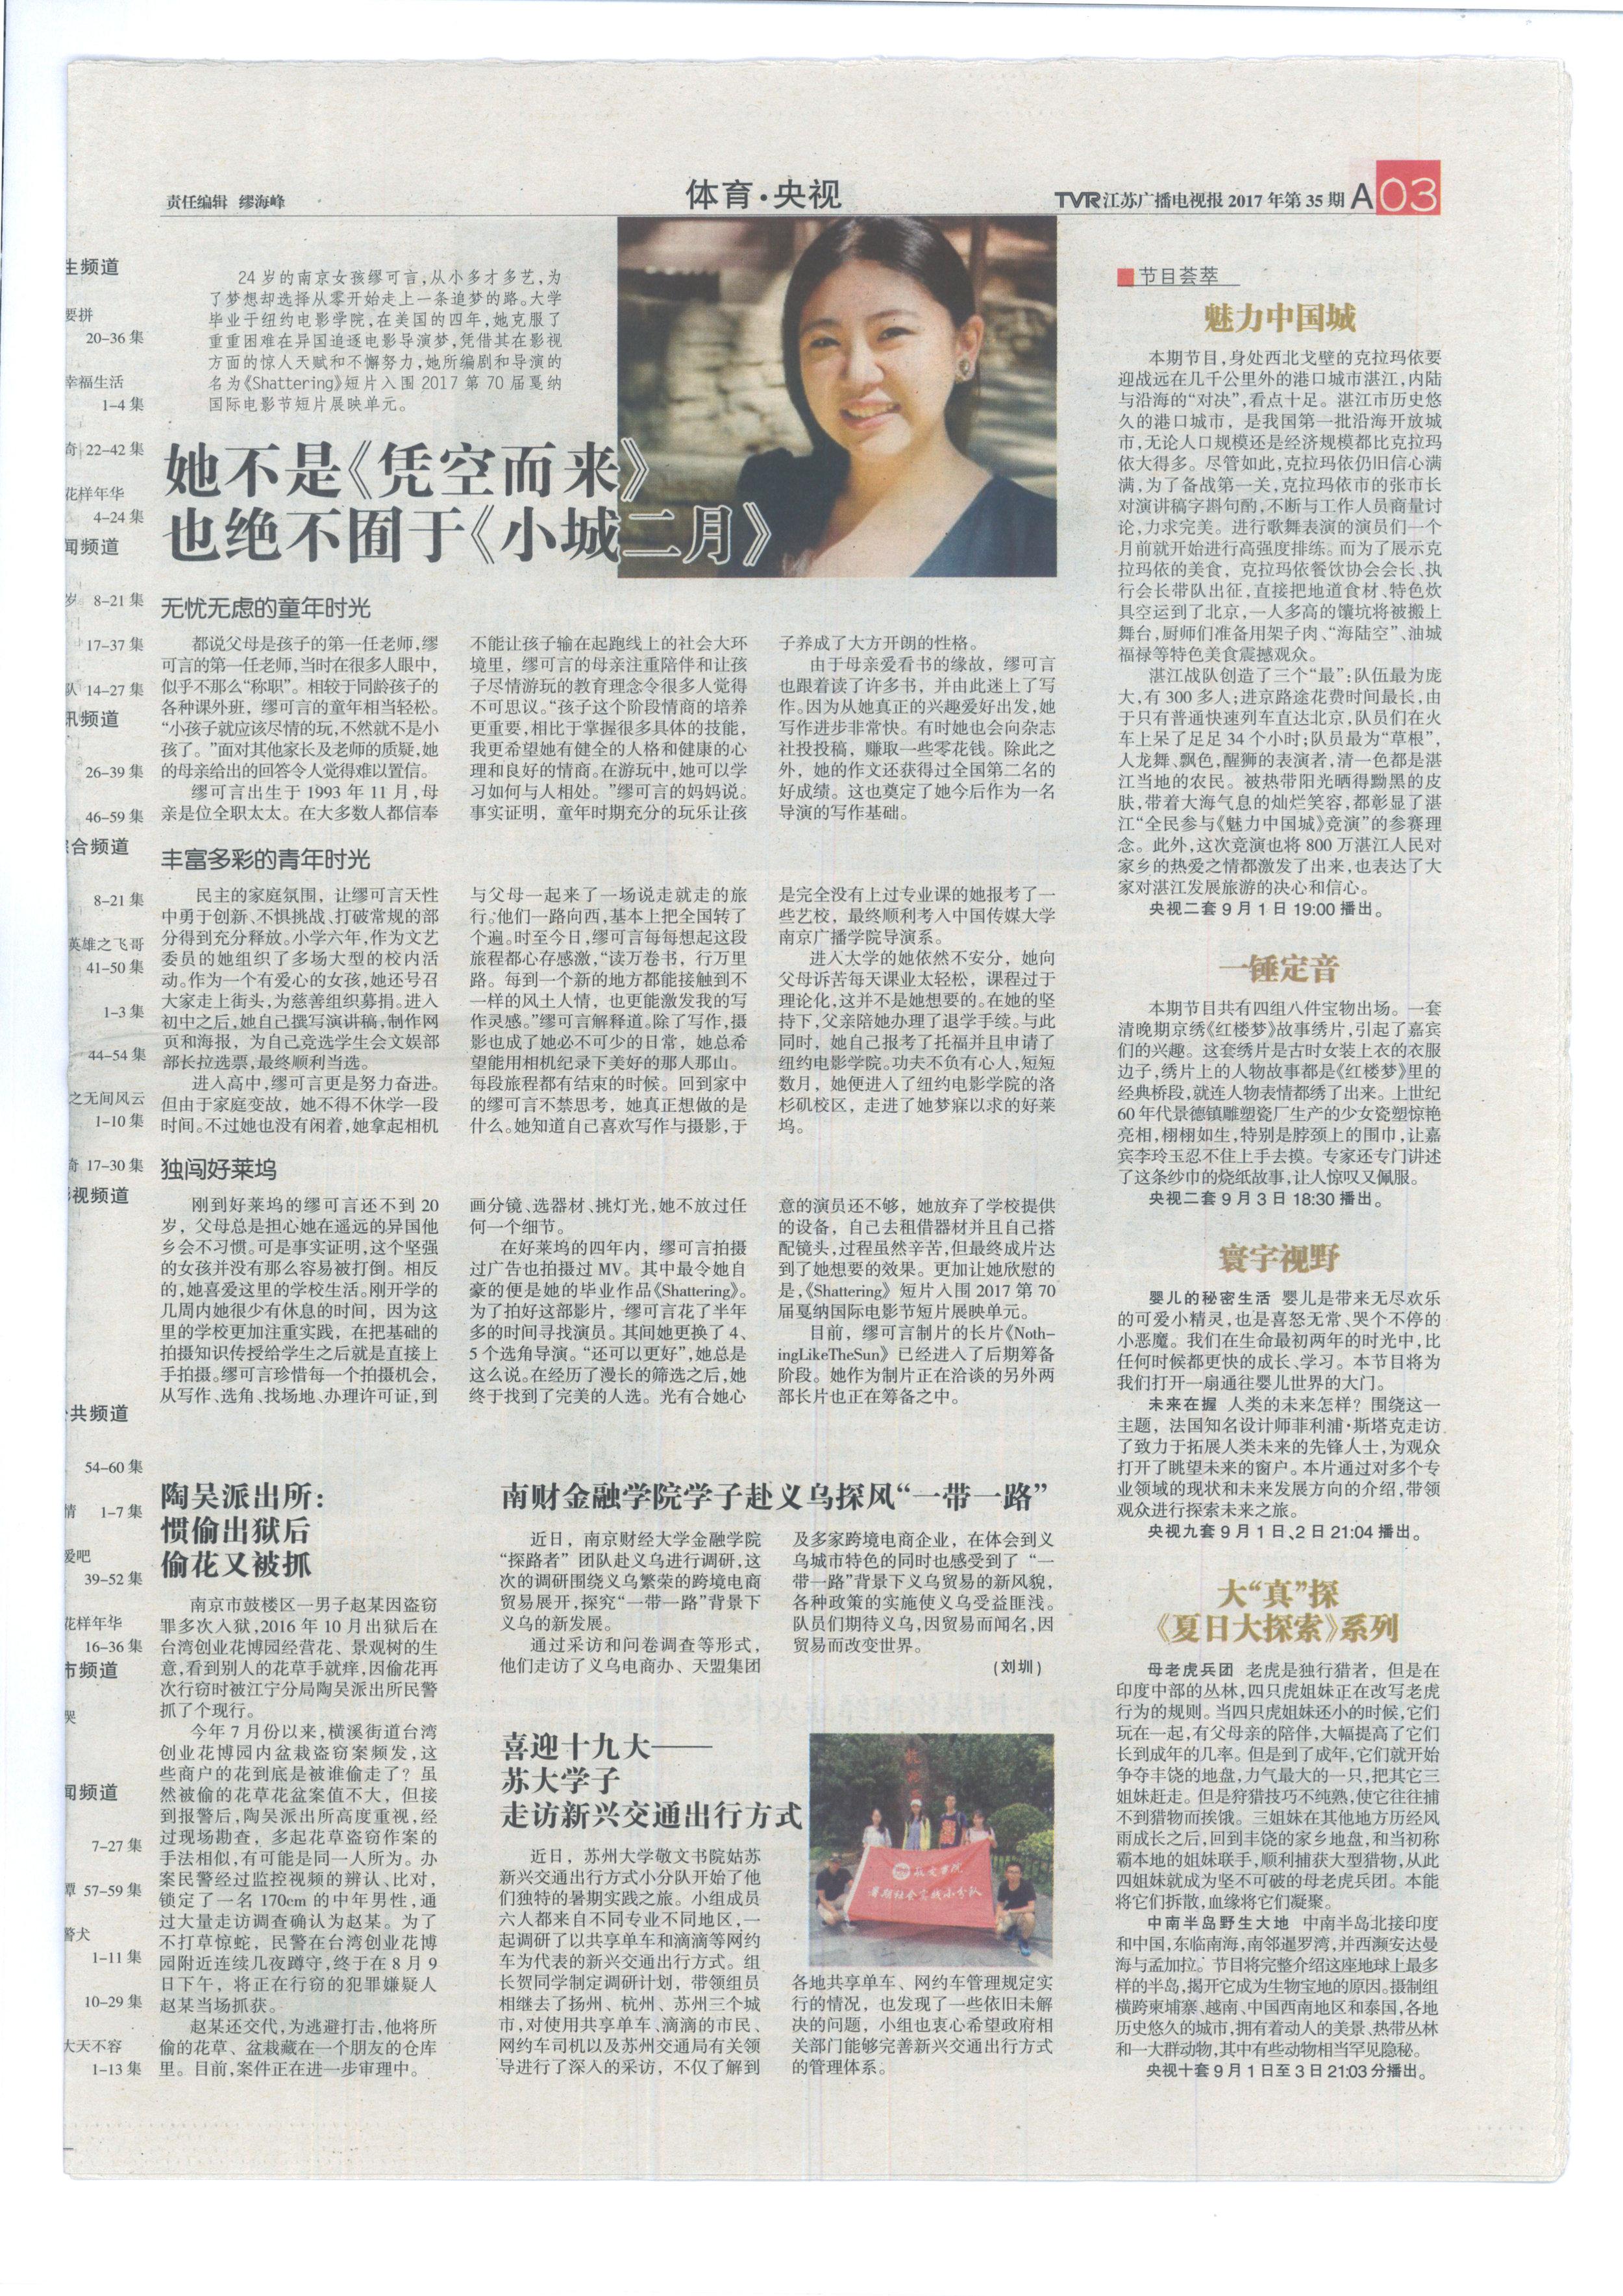 TVR Newspaper